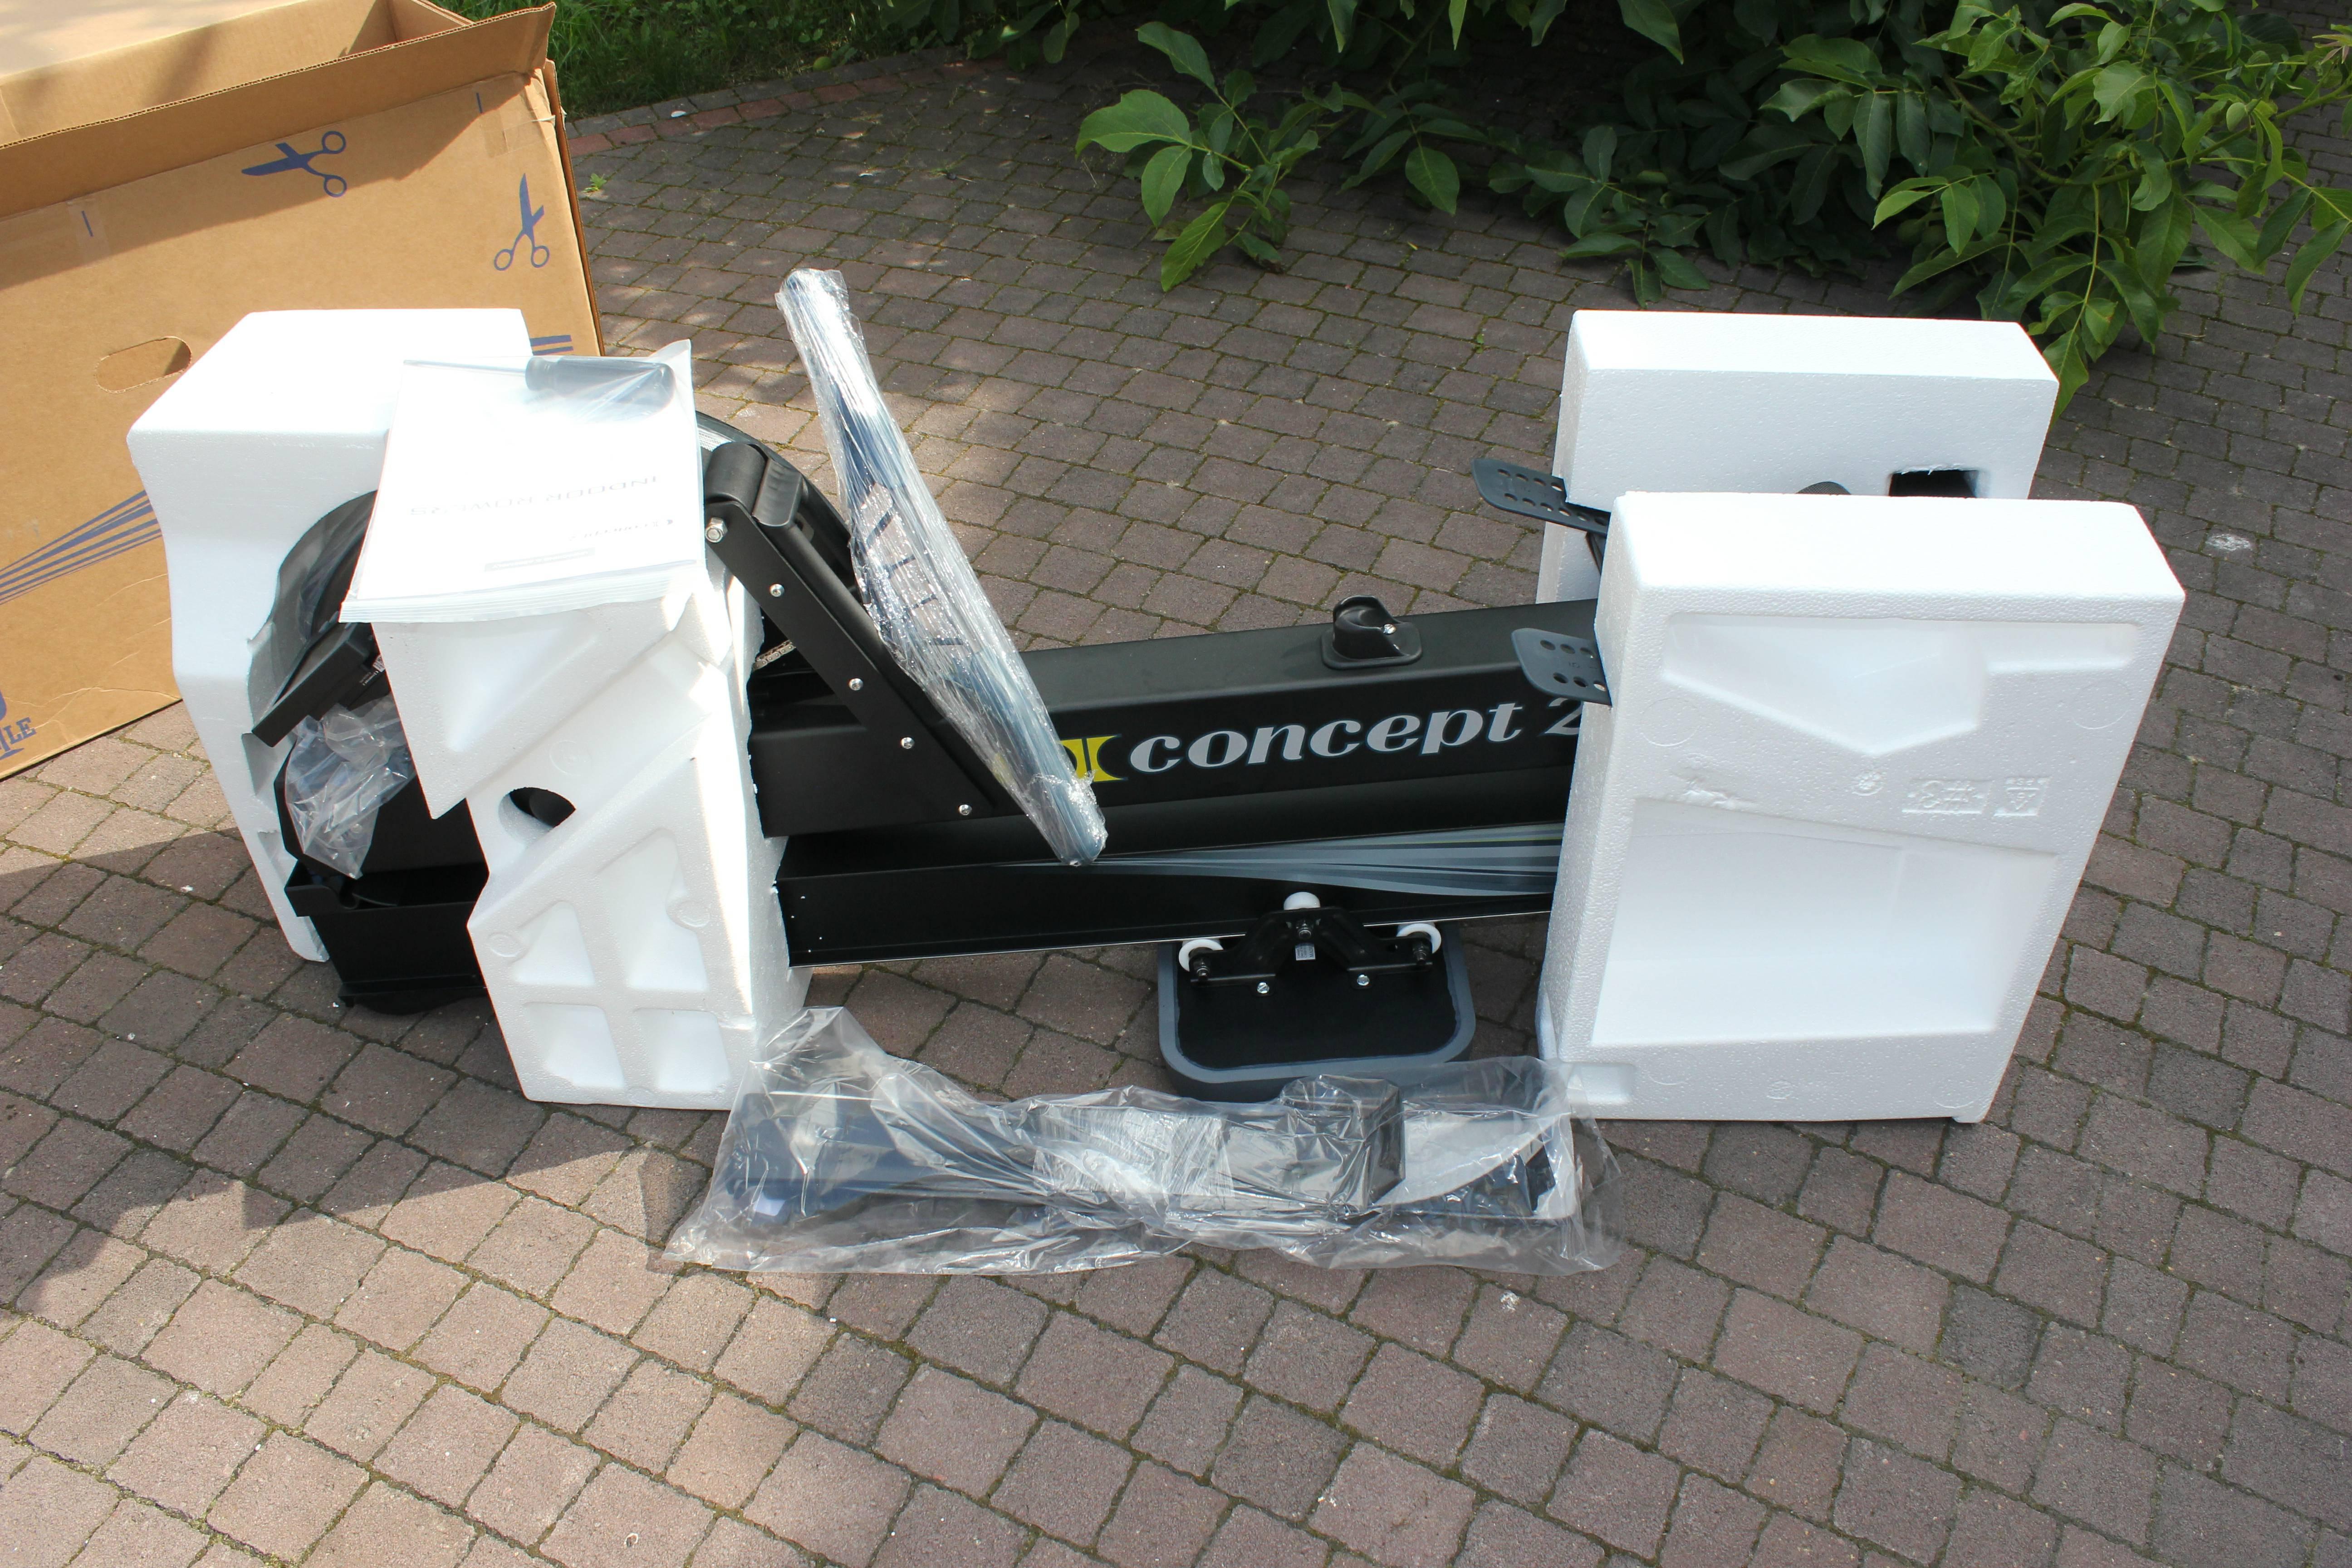 Гребной тренажер CONCEPT 2 MODEL D ROWER - PM5